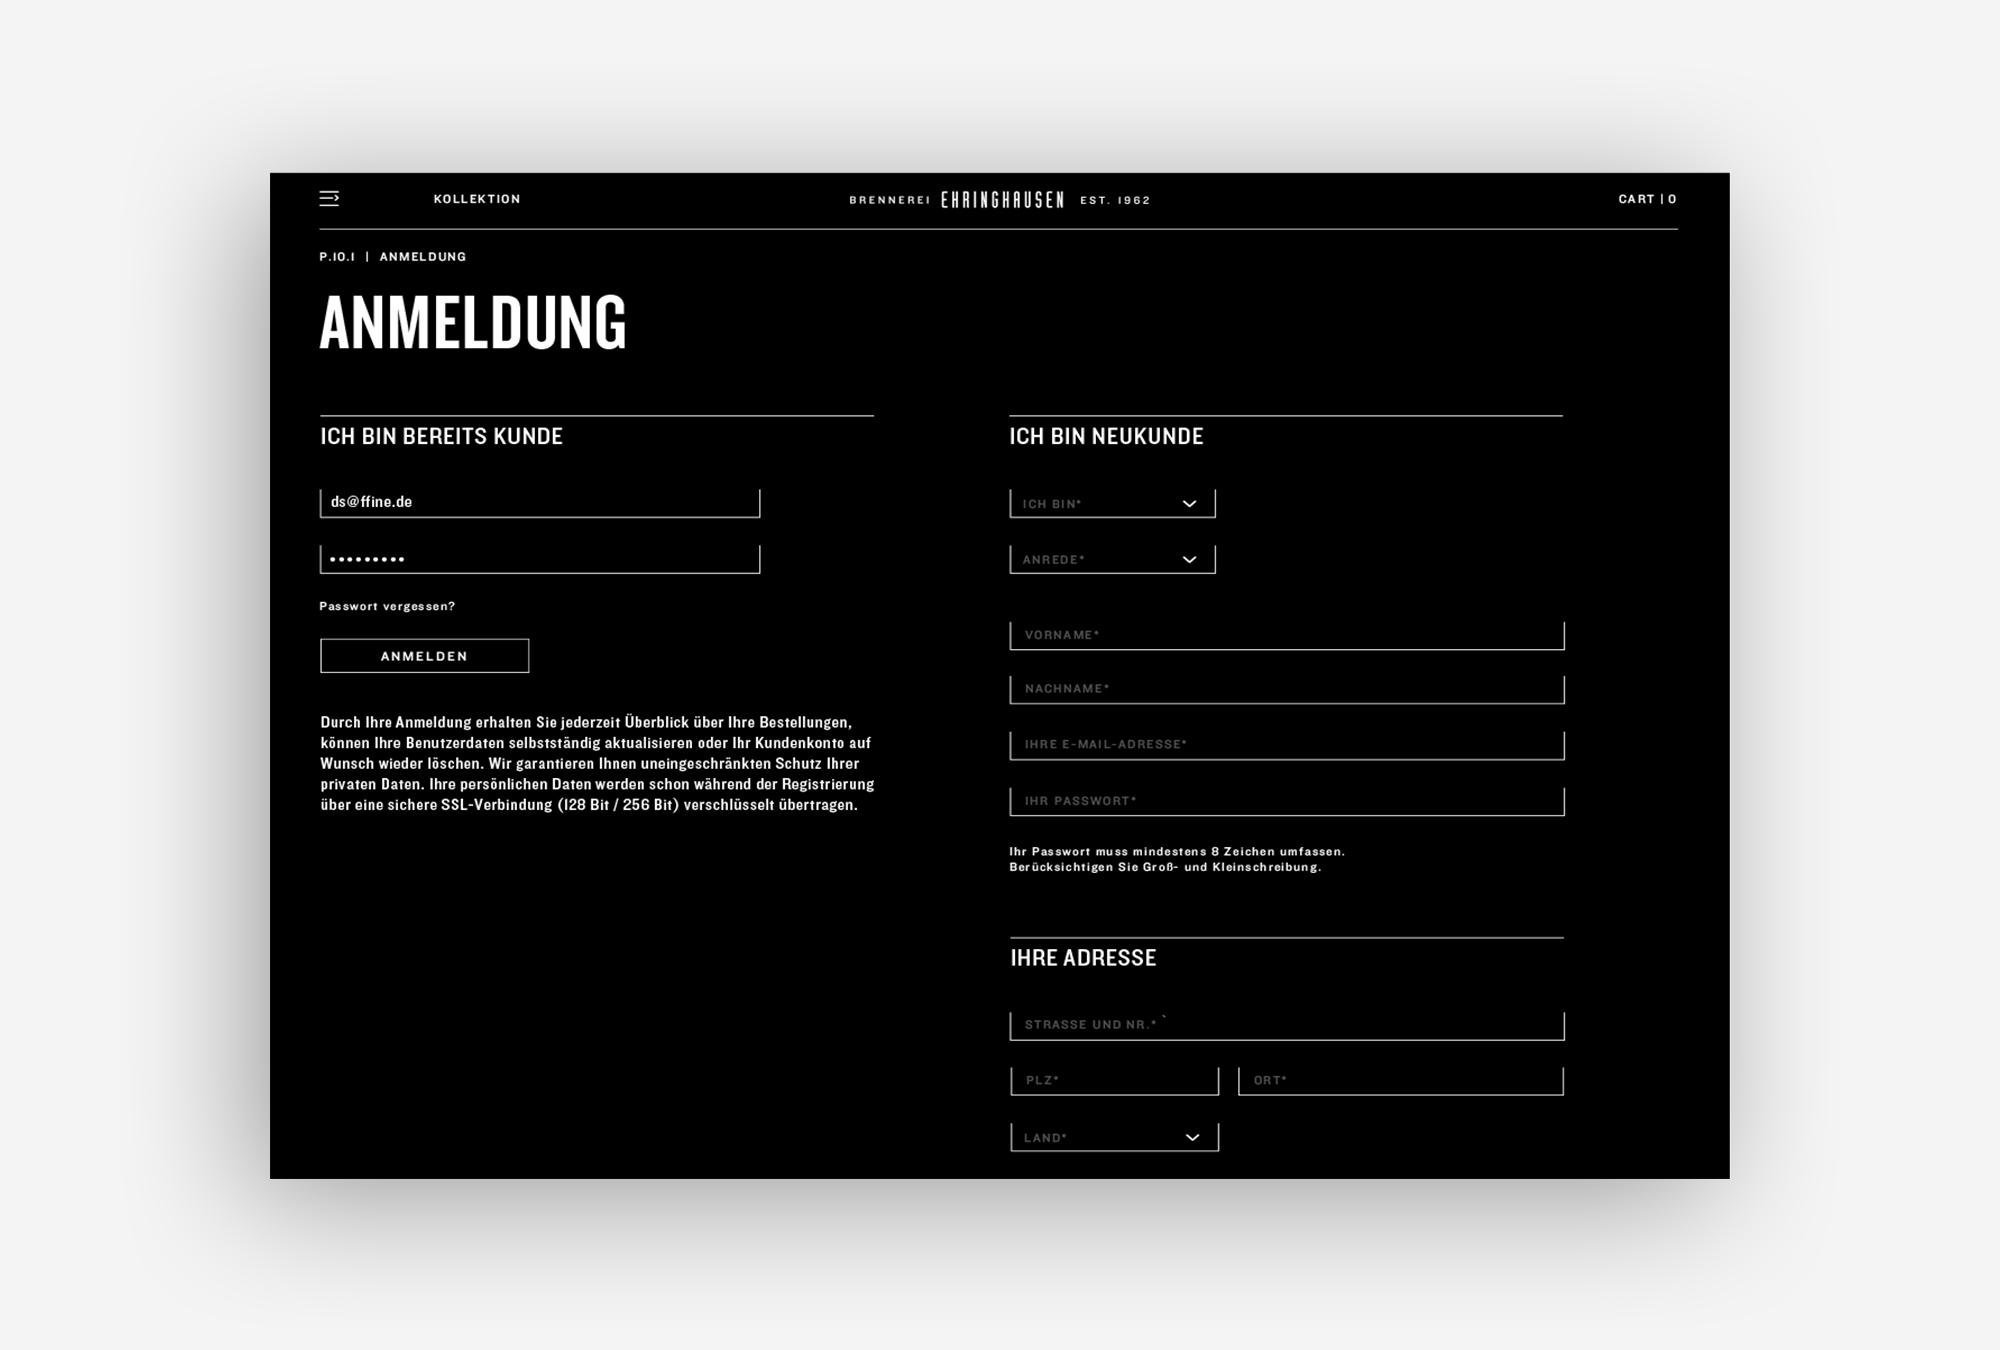 ffine-Portfolio_Brennerei-Ehringhausen_web_12.jpg